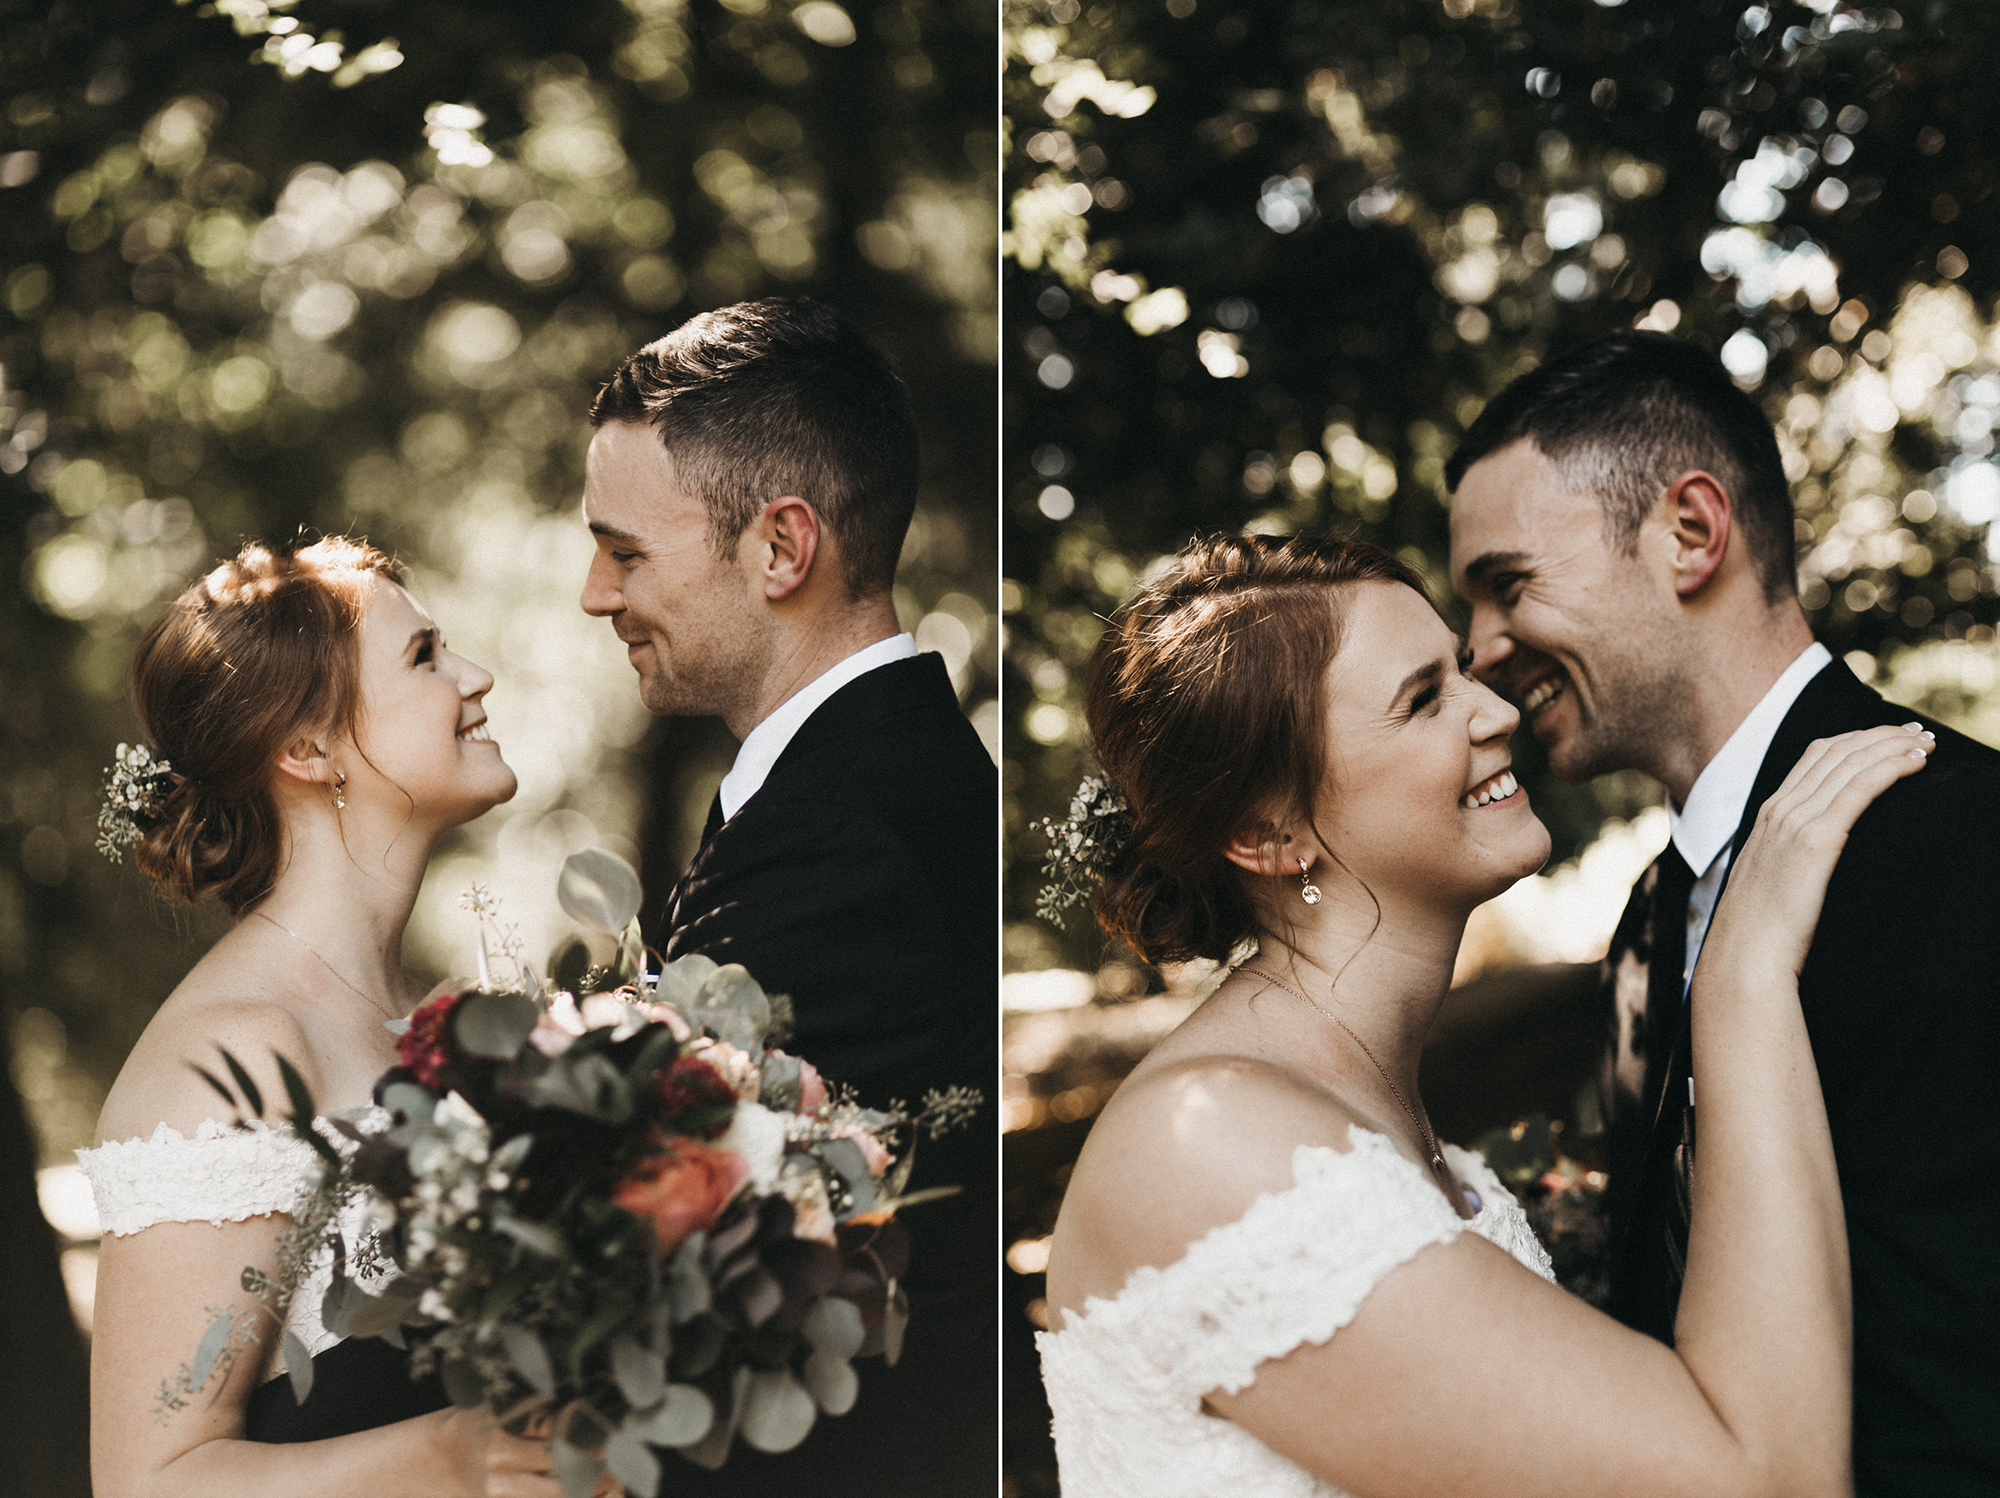 the_evergreen_portland_wedding-23.jpg